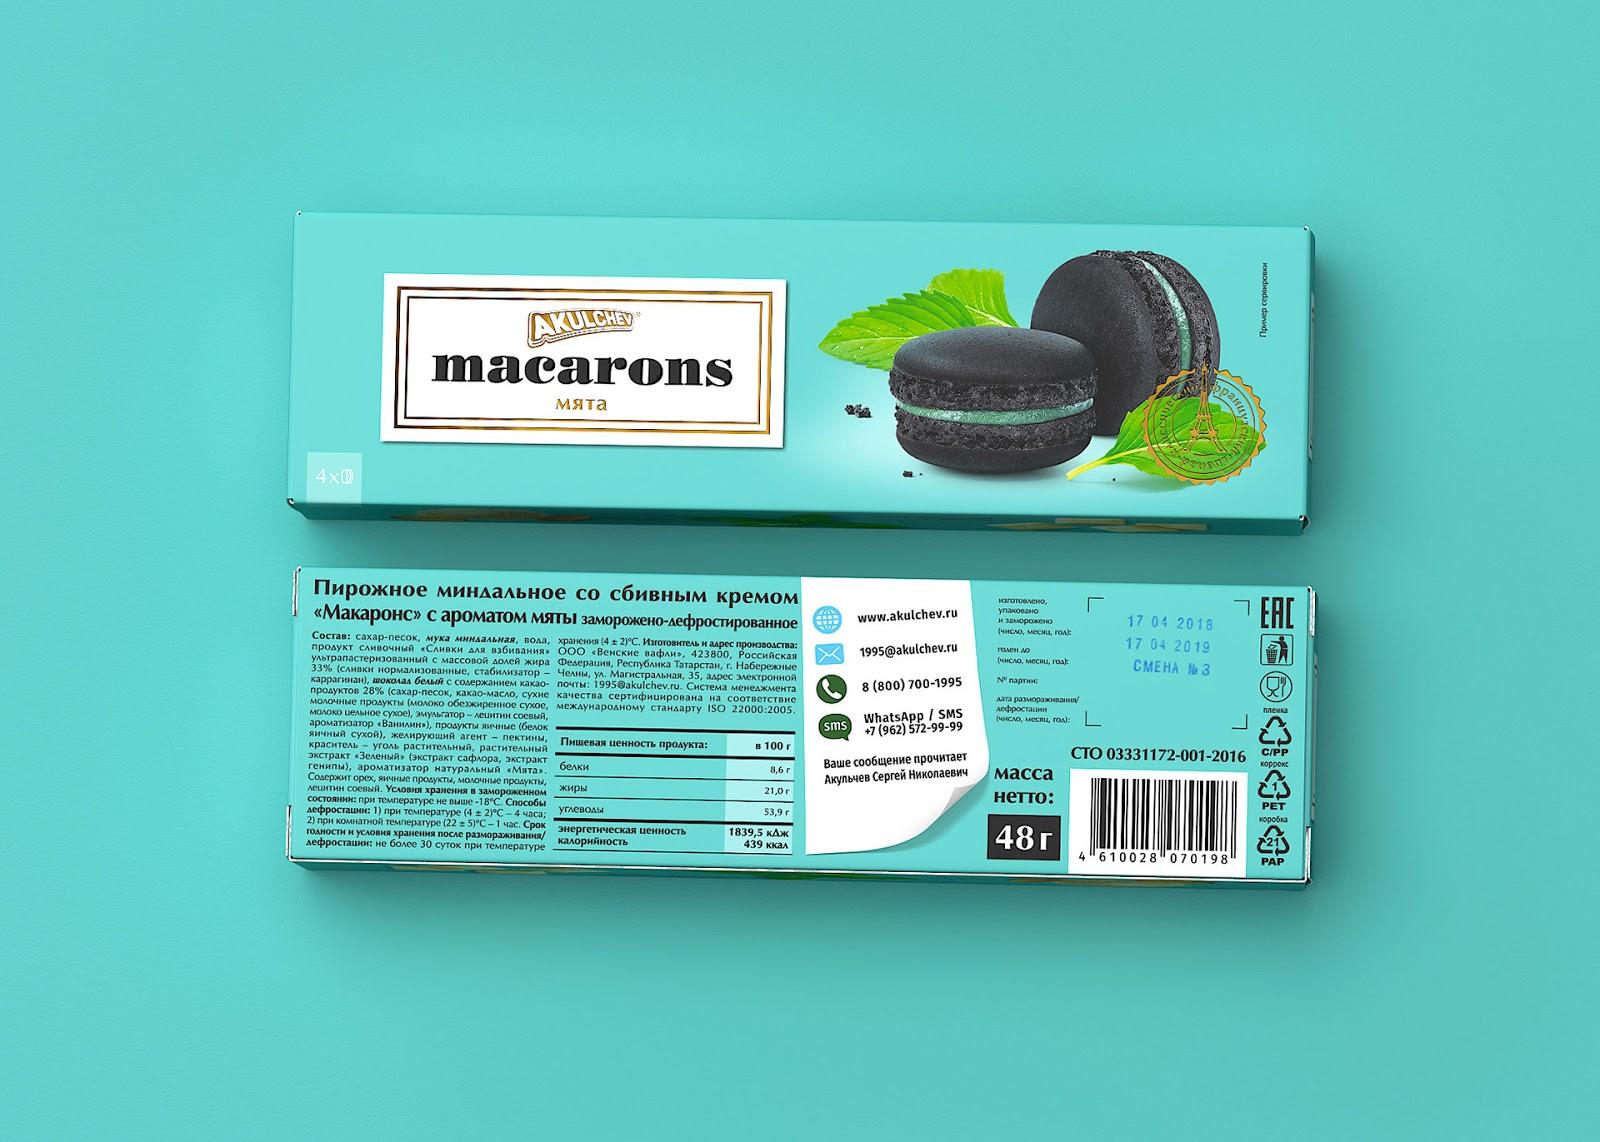 Akulchev Macrons马卡龙包装设计